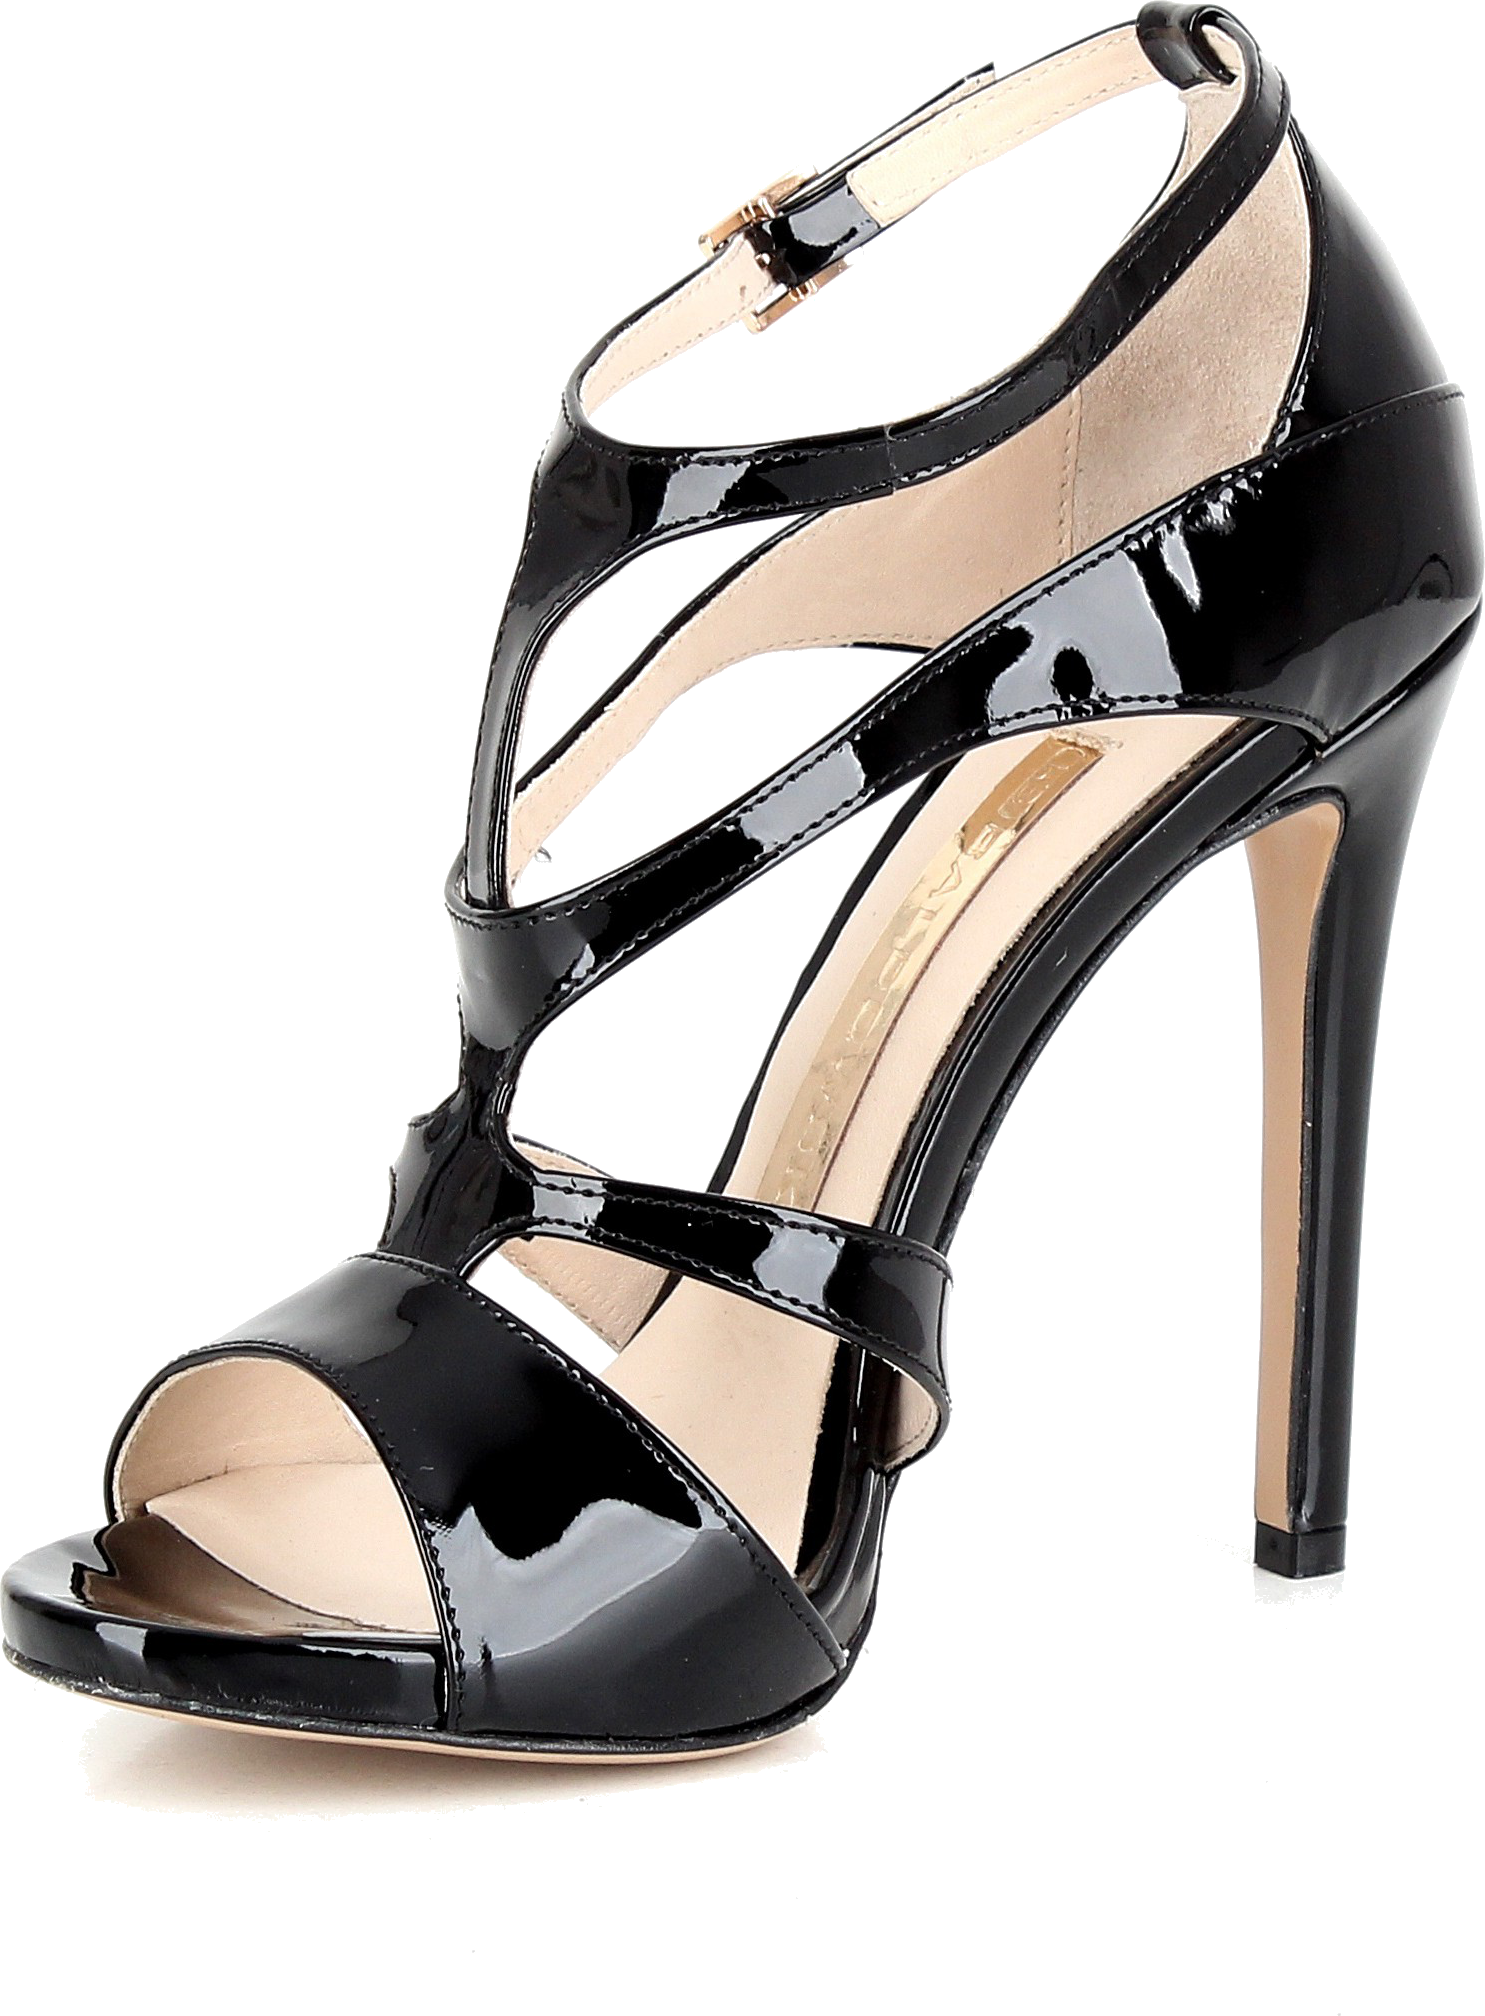 Sandały D01005